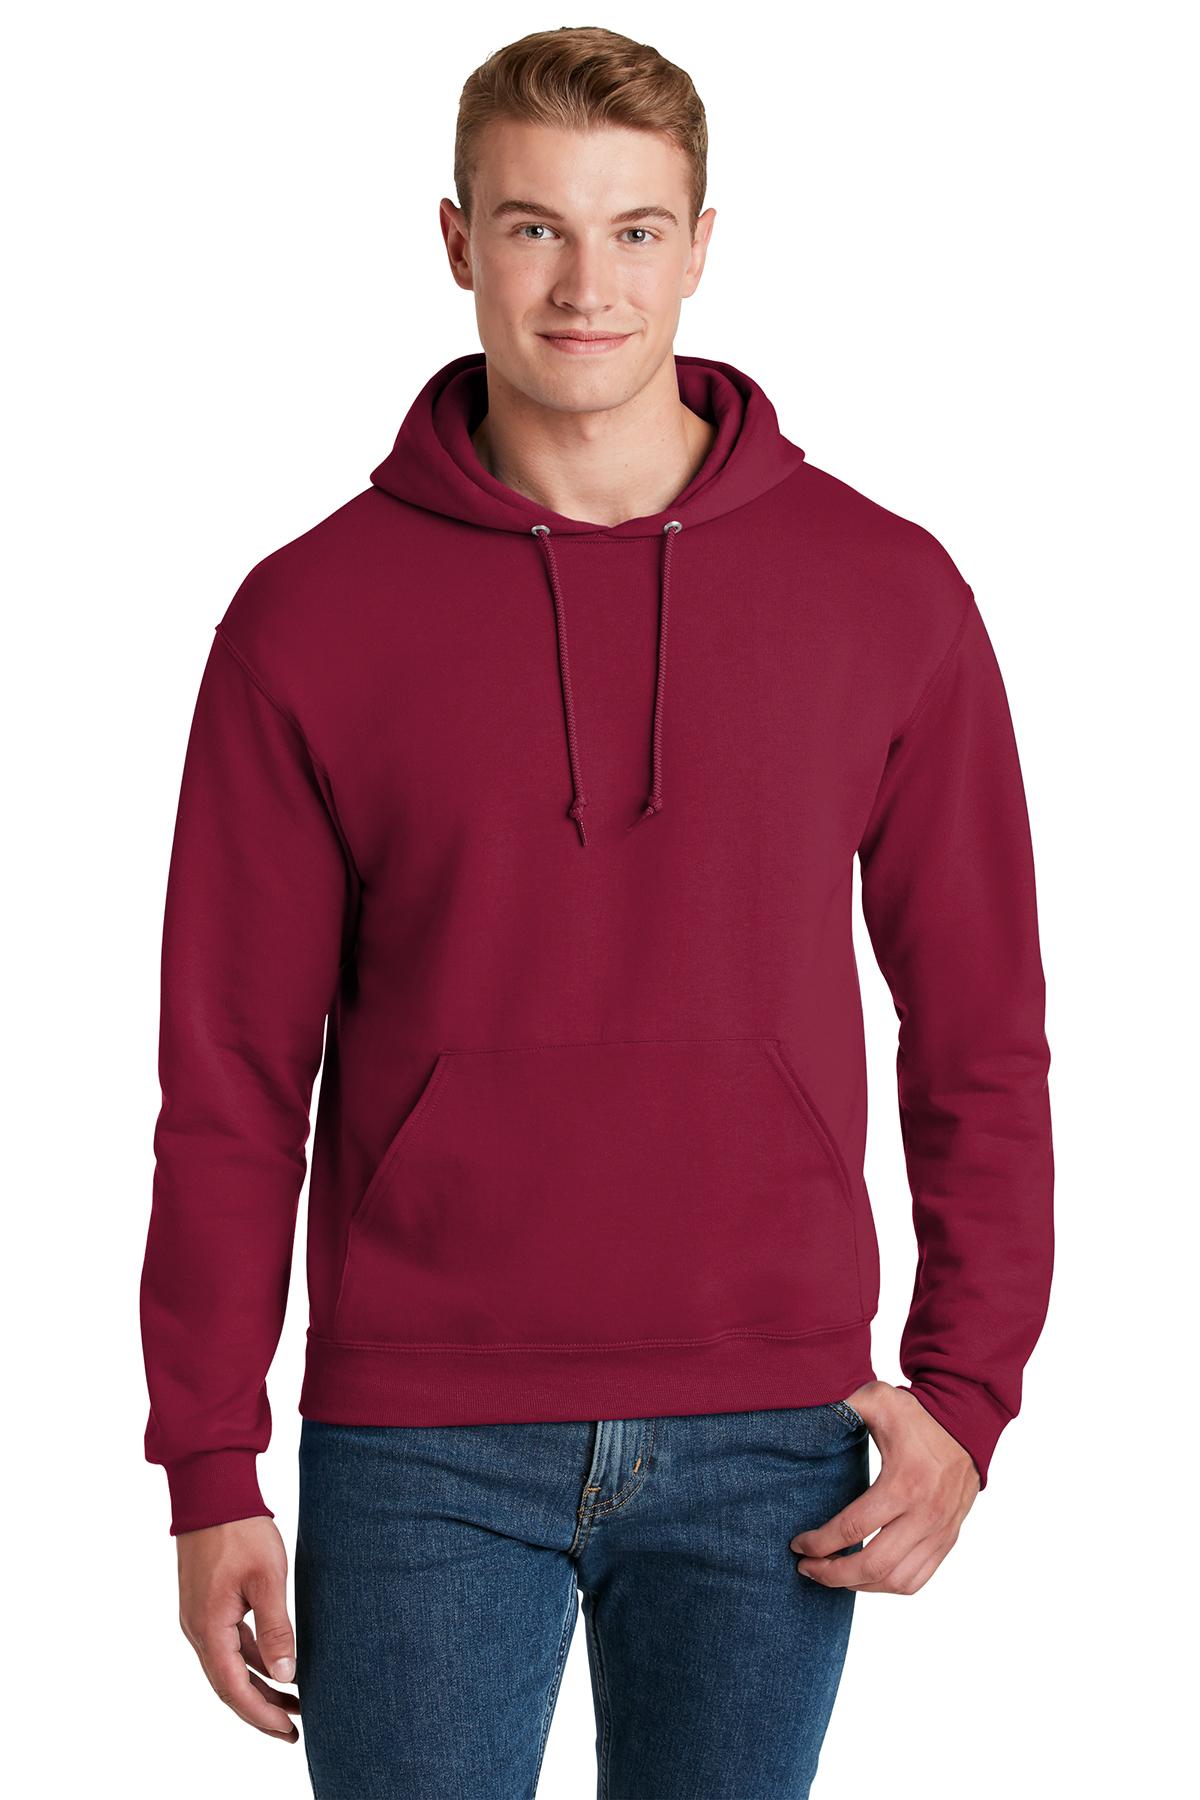 50//50 NuBlend Fleece Pullover Hood Jerzees Youth 8 oz. 996Y ATHLETIC HEATHER